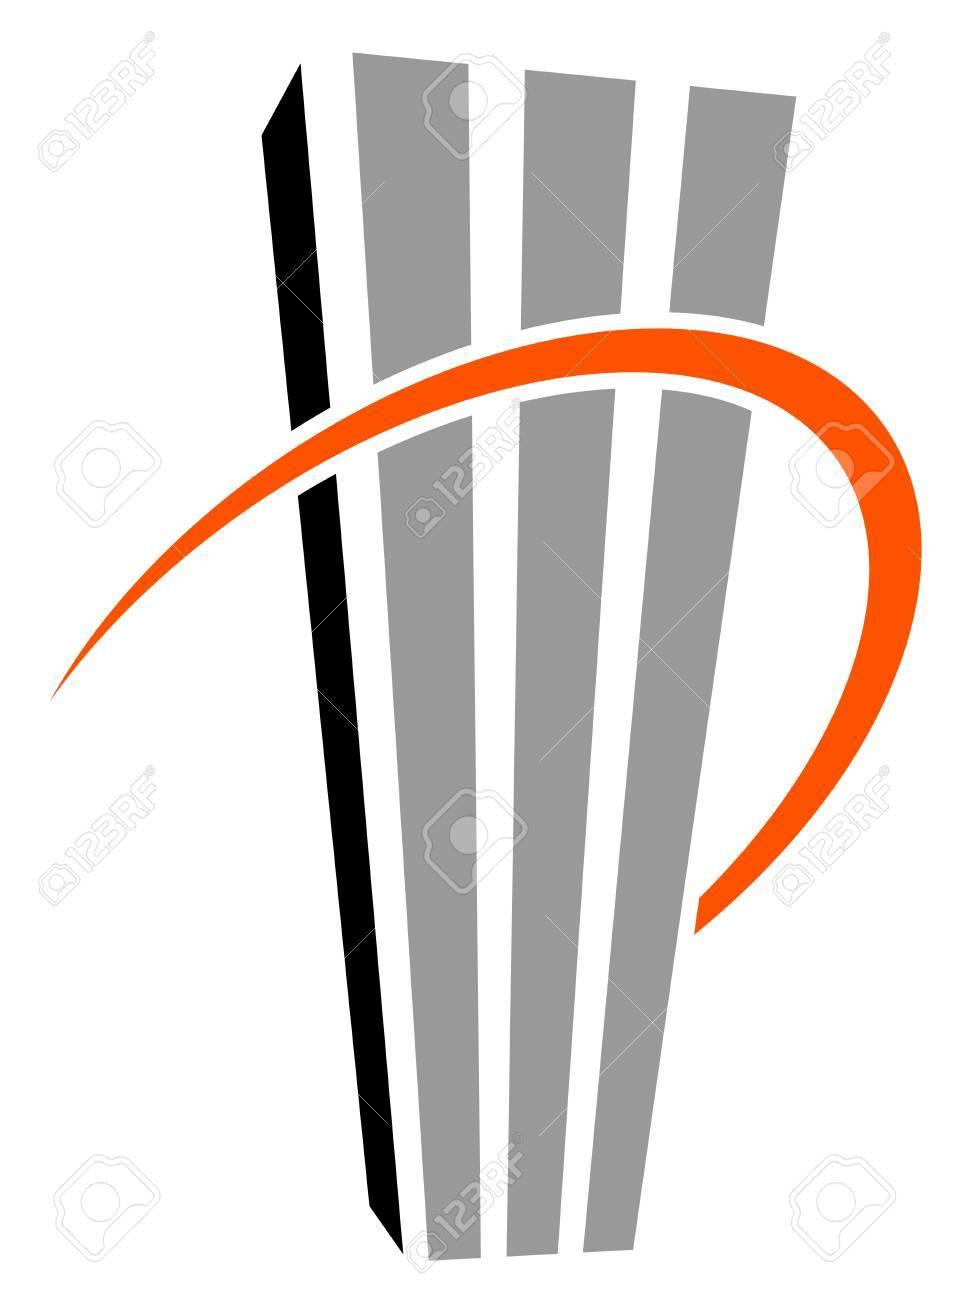 vector skyscraper symbol Stock Vector - 11519755